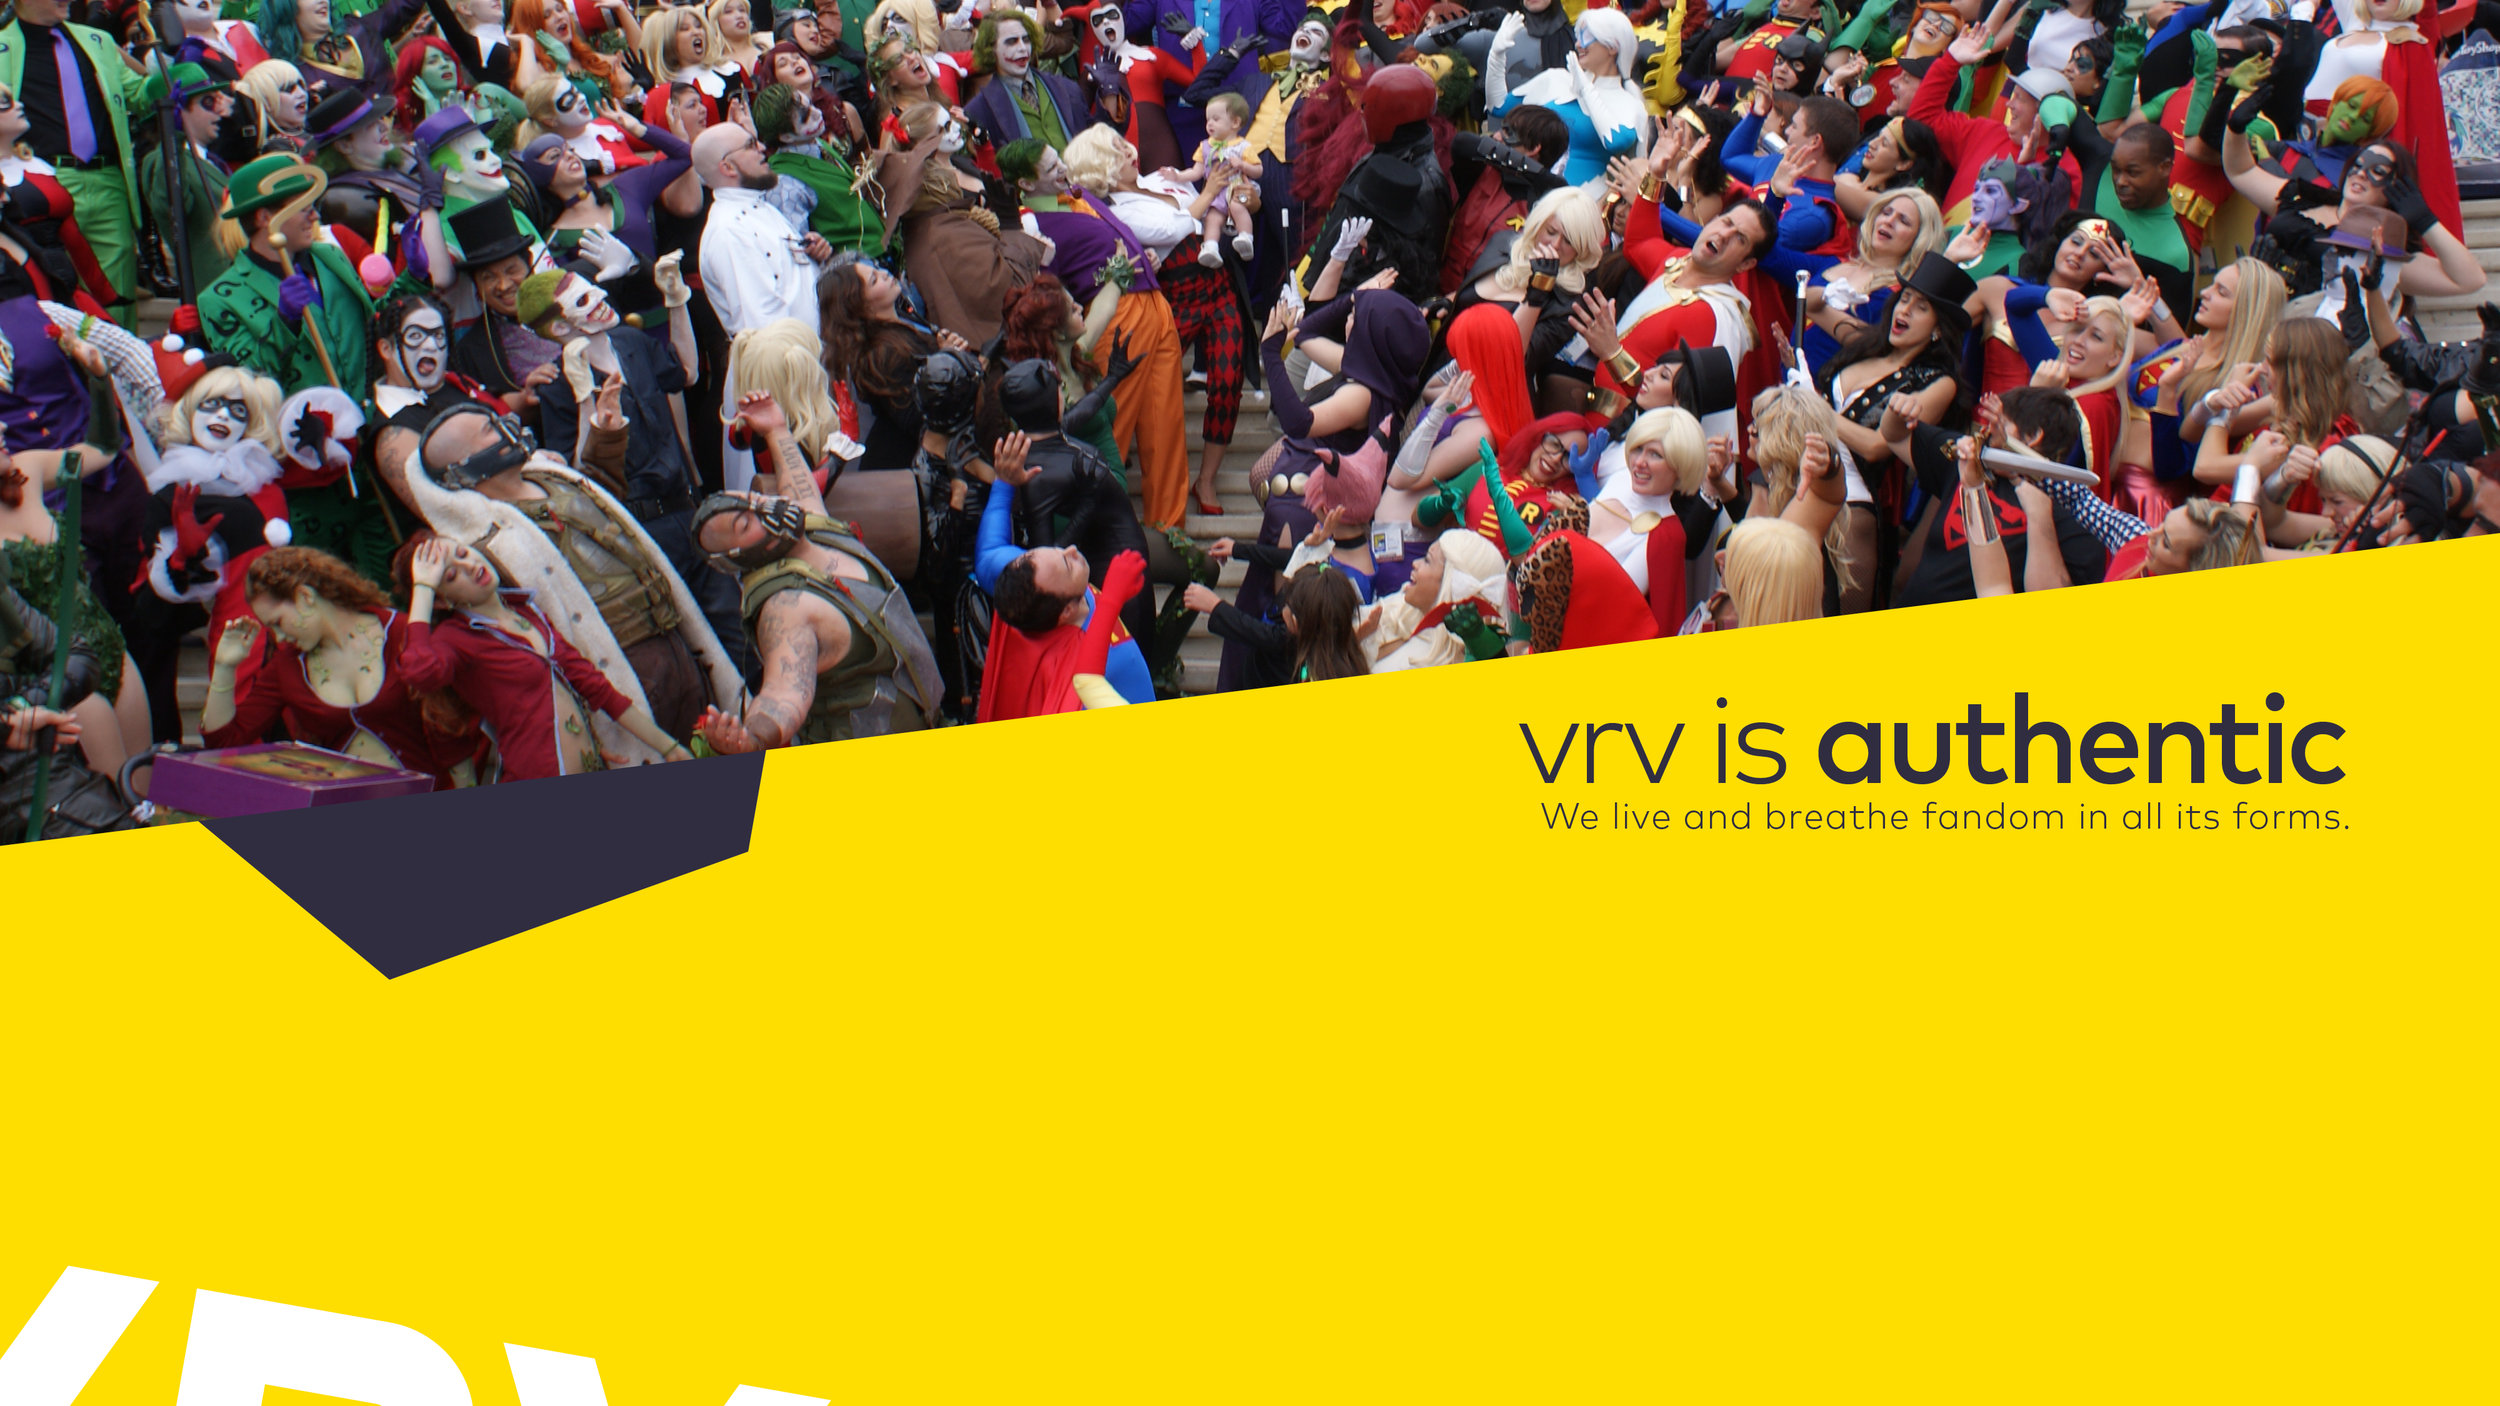 VRV_BrandBook_Alpha1_Deck_16x93.jpg